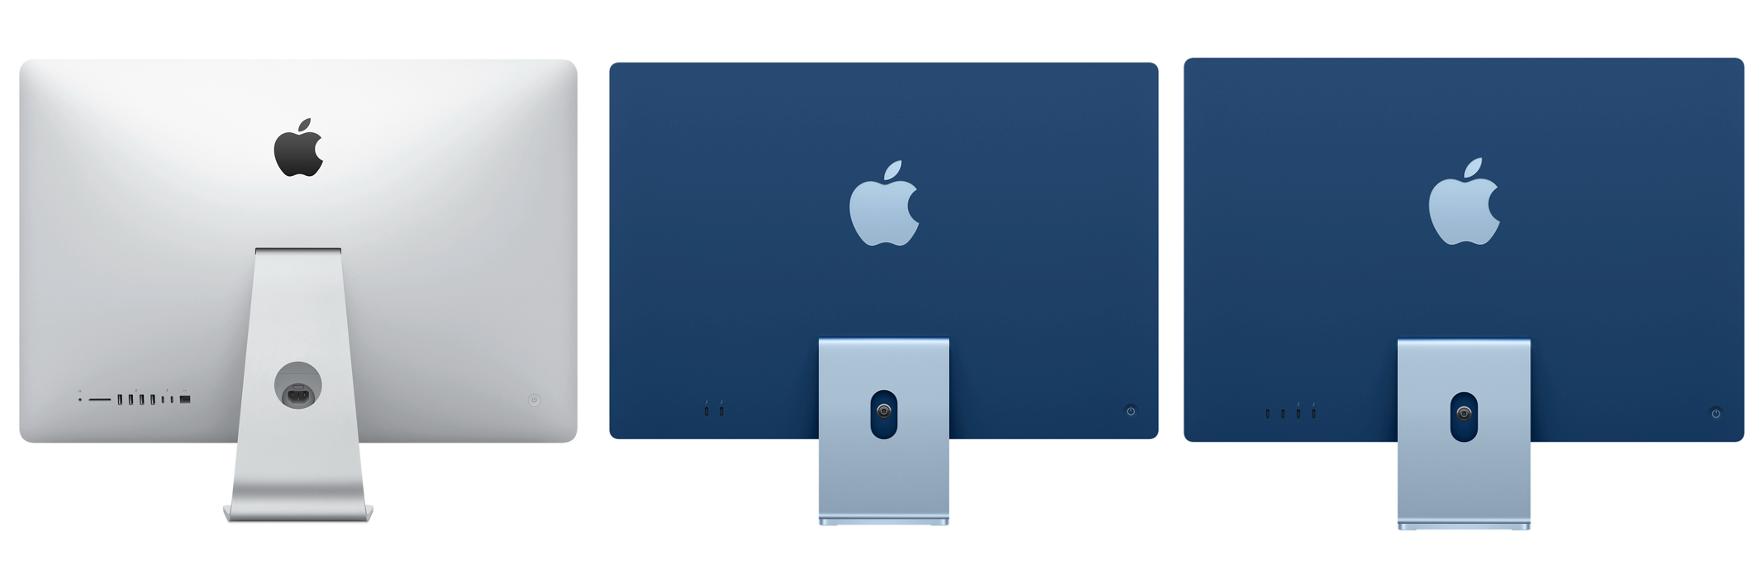 Portas iMac M1 e Intel